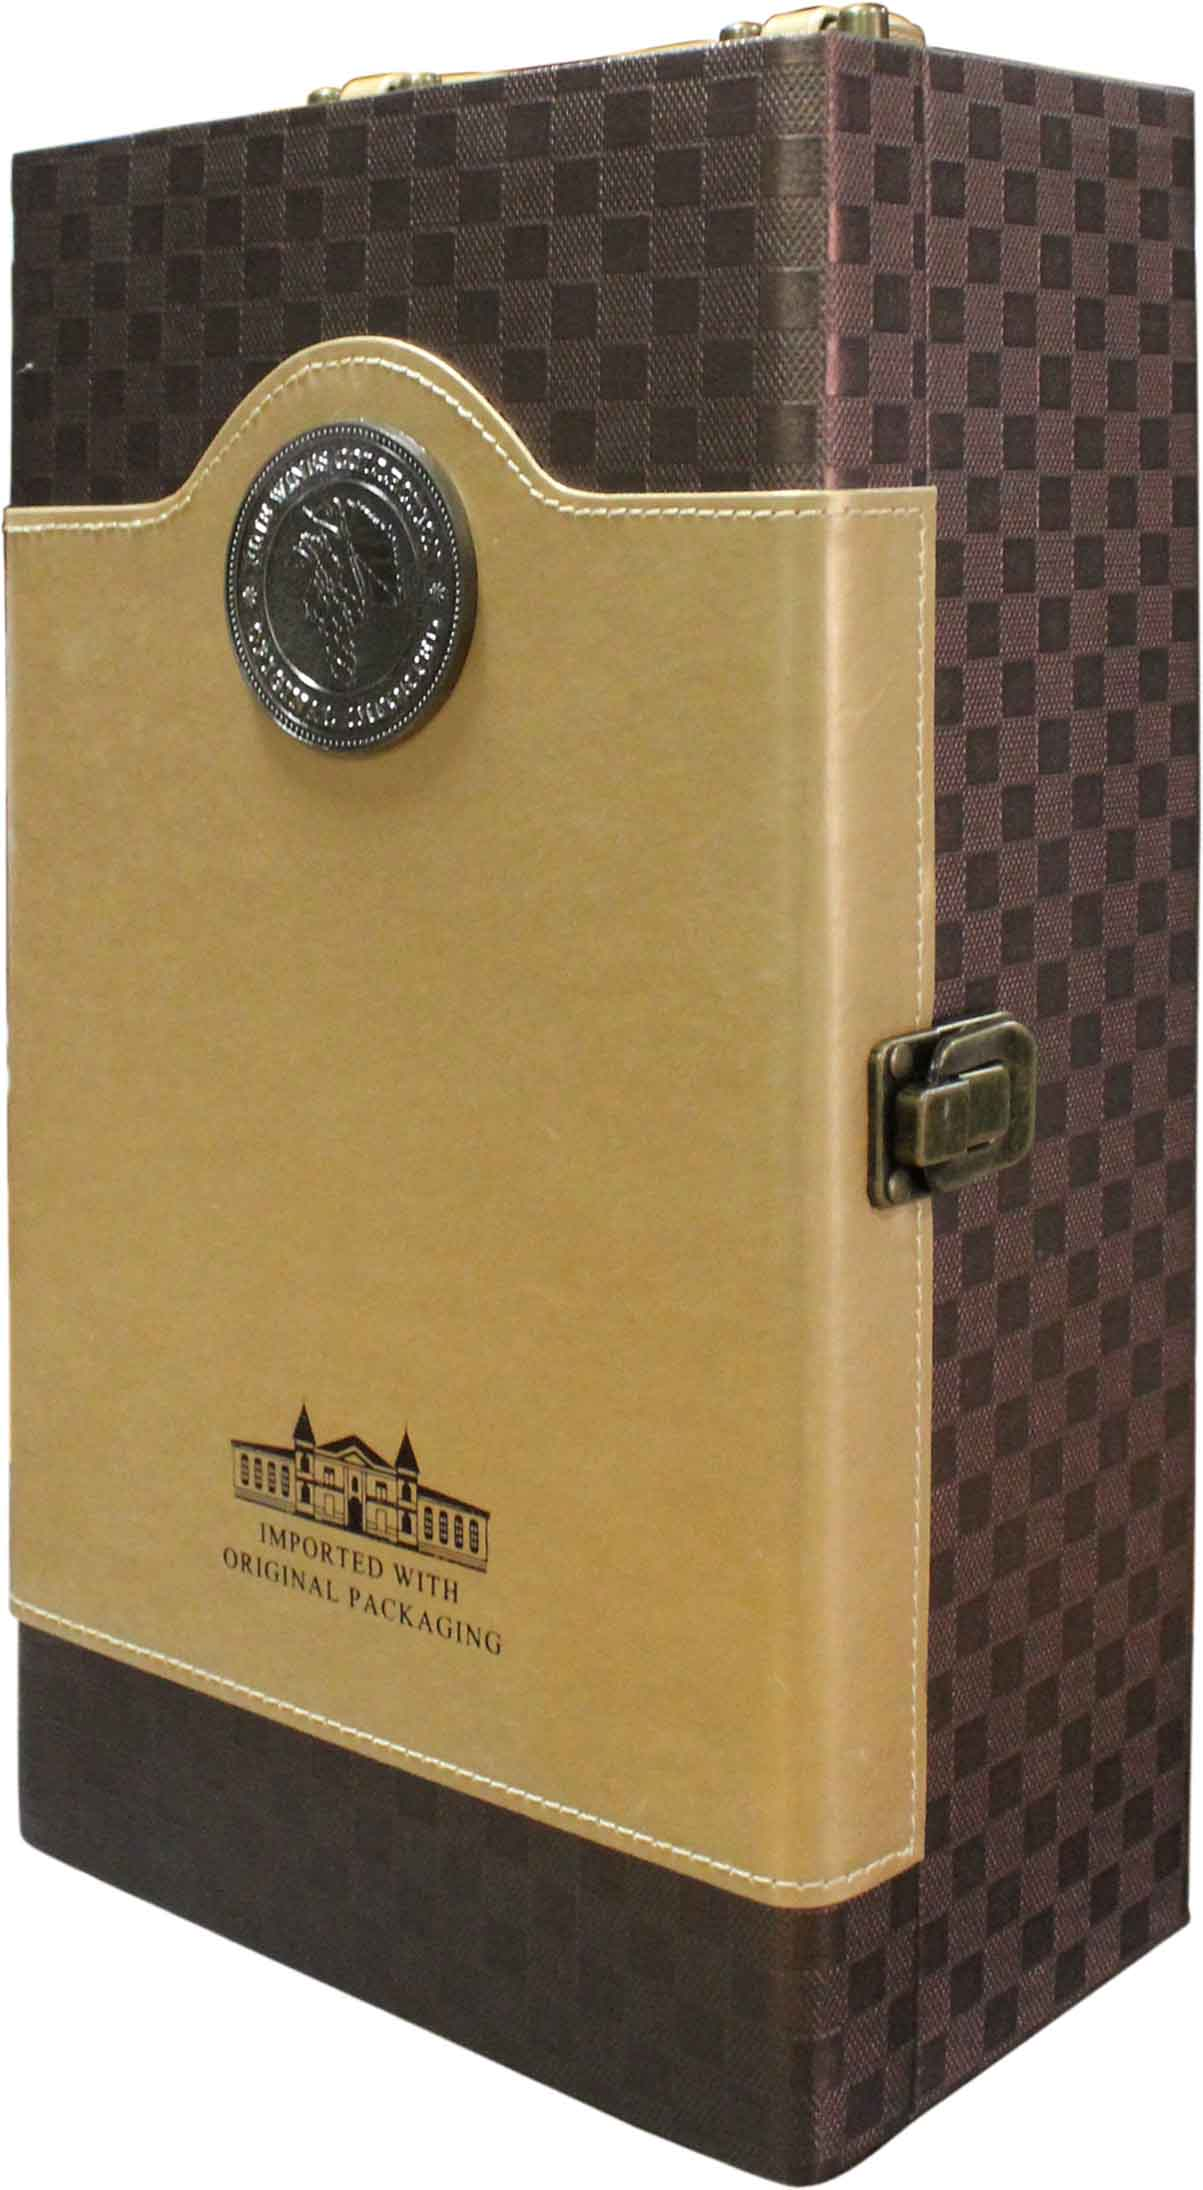 Luxury double leather box